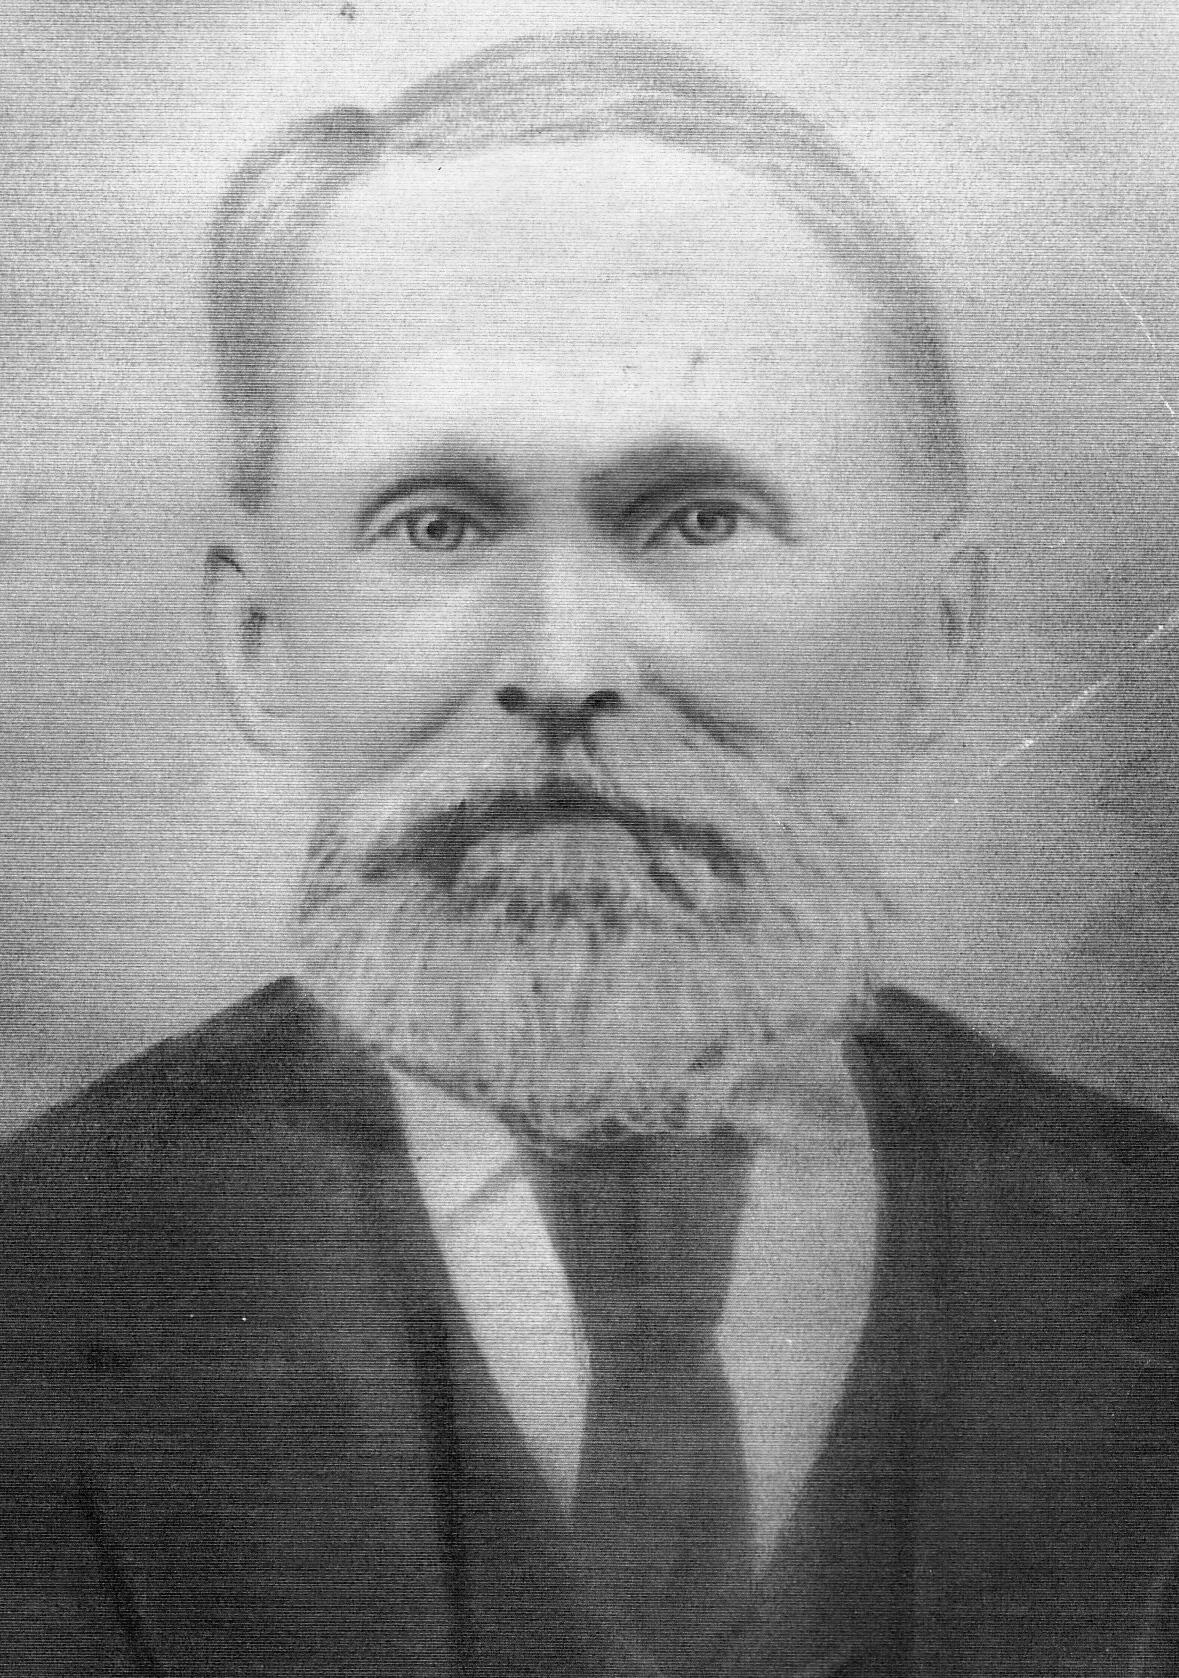 Porter, Nahum Bisbee